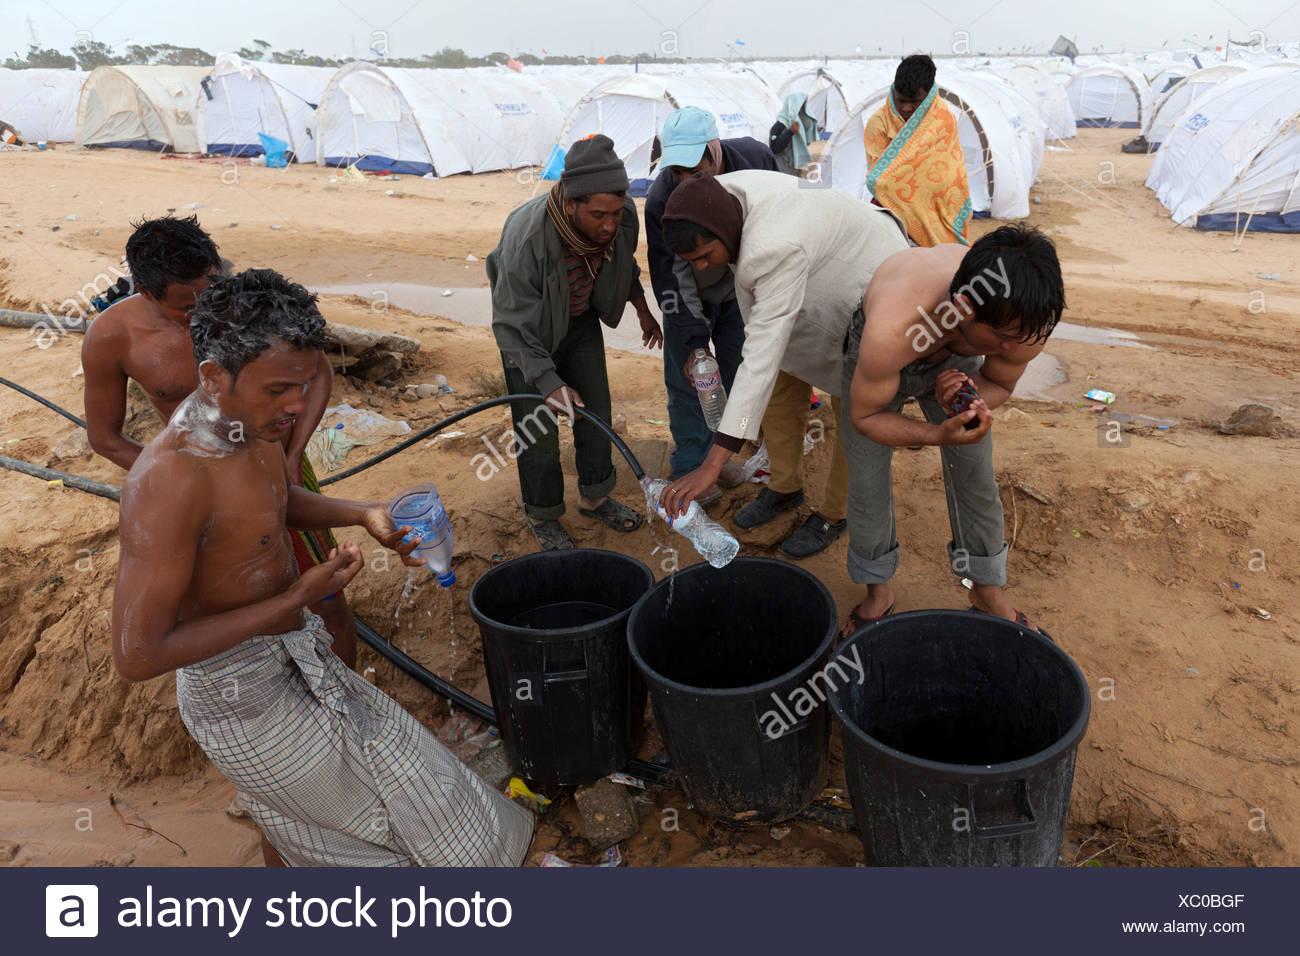 Bangladeshi washing themselves in the Shousha refugee camp, Ben Gardane, Tunisia - Stock Image